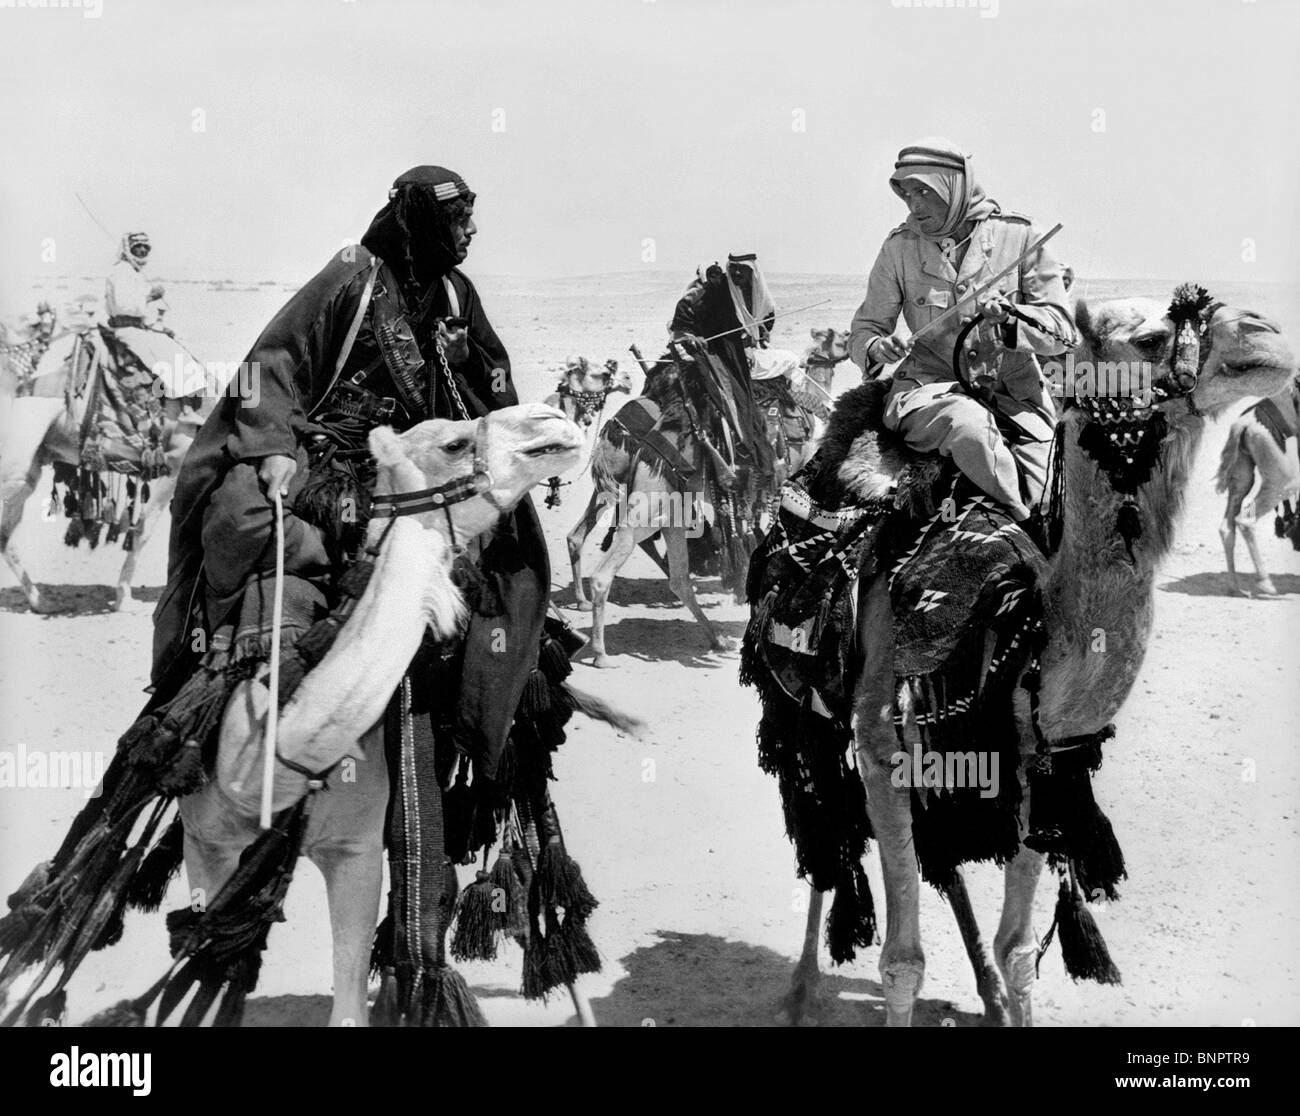 Lawrence Of Arabia David Lean: OMAR SHARIF & PETER O'TOOLE LAWRENCE OF ARABIA (1962 Stock